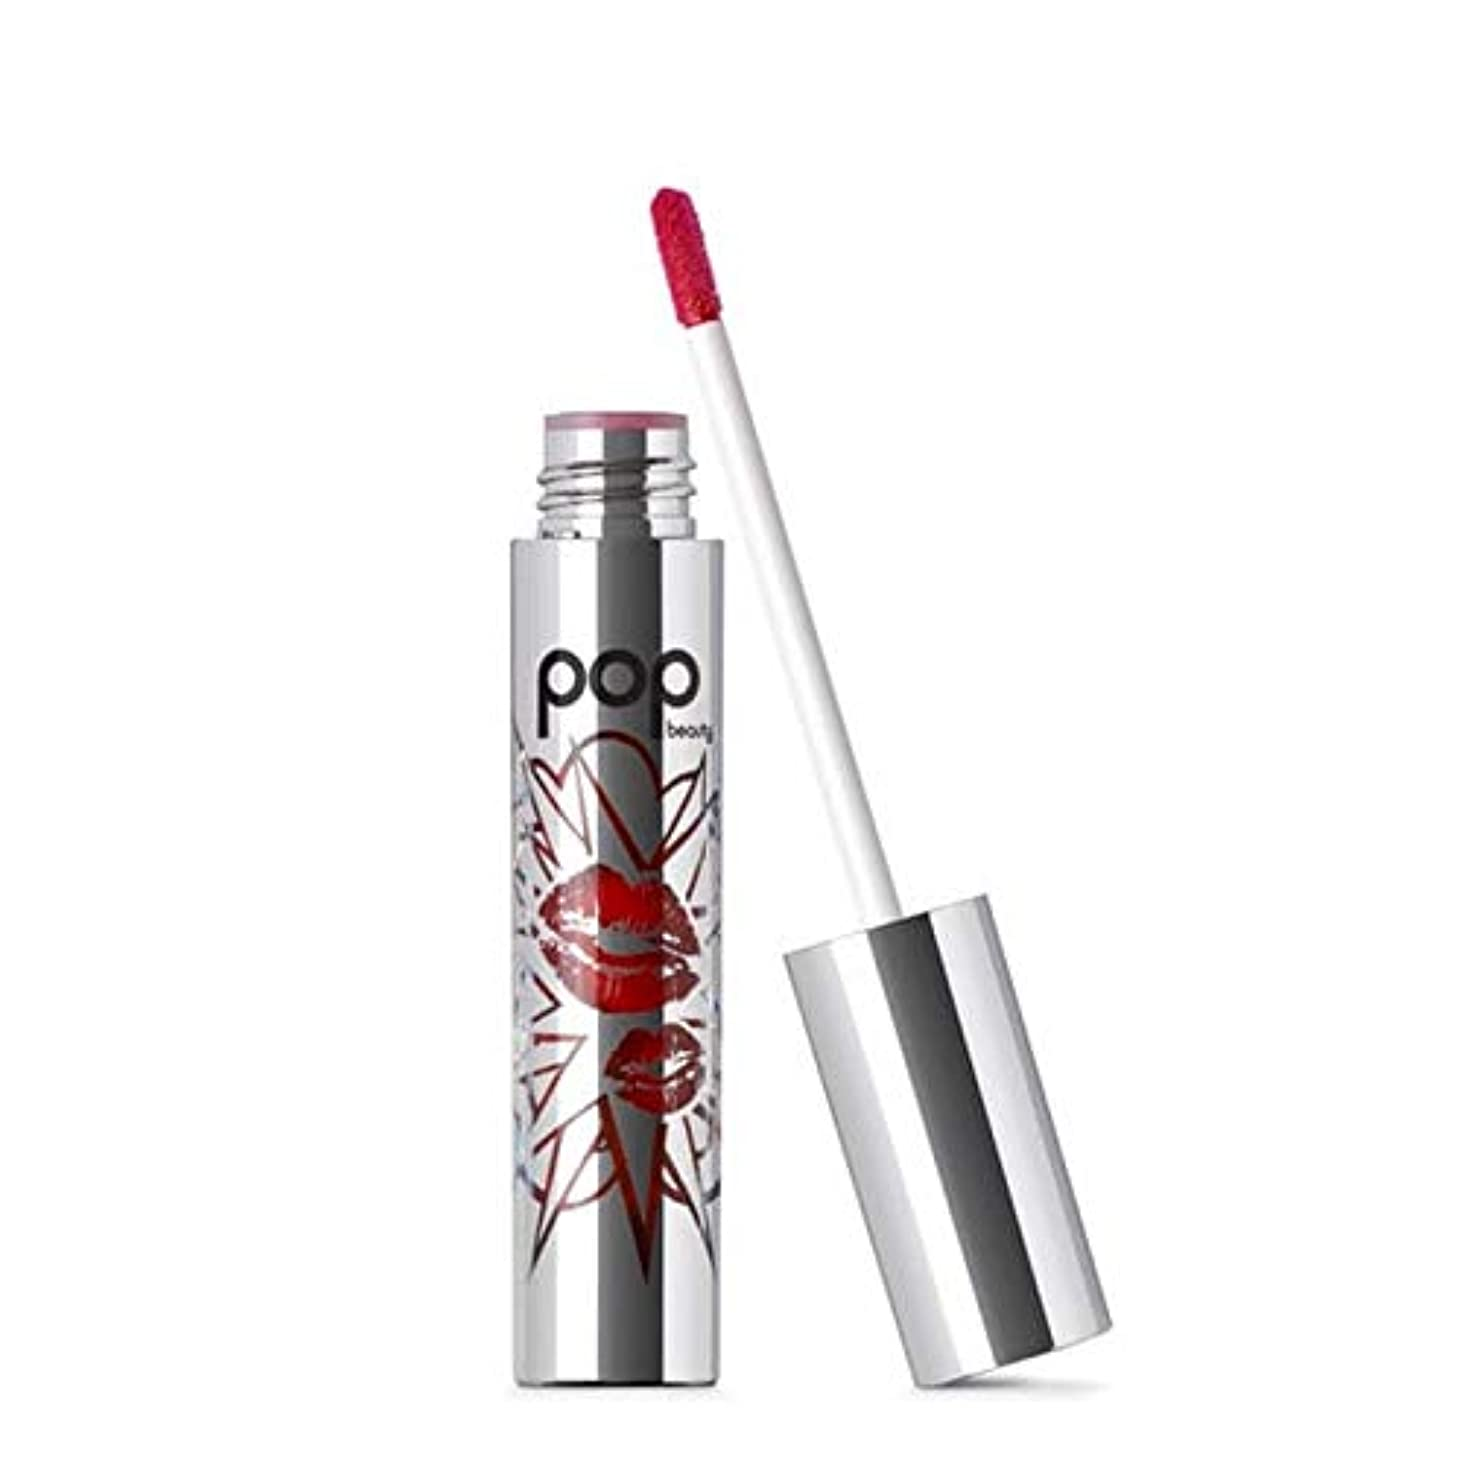 [Pop ] 永久ふくれっ面ルージュ赤をポップ - Pop Permanent Pout Rouge Red [並行輸入品]